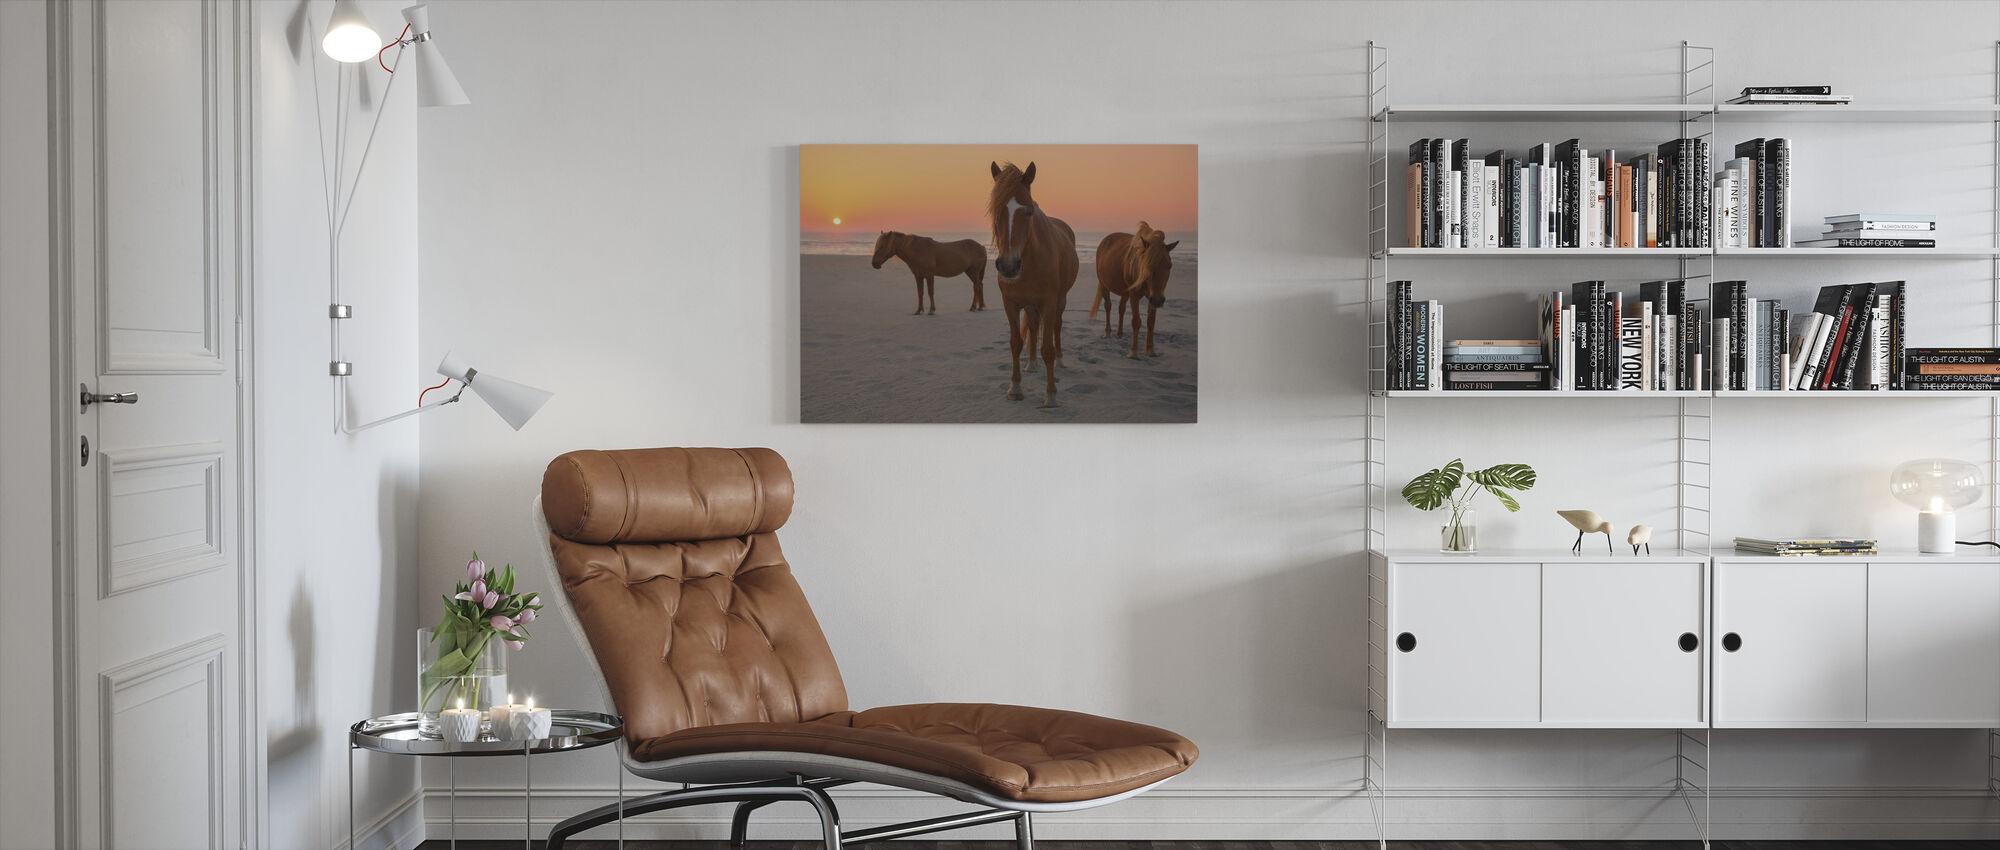 Chestnut Horses on Sunset Beach - Canvas print - Living Room